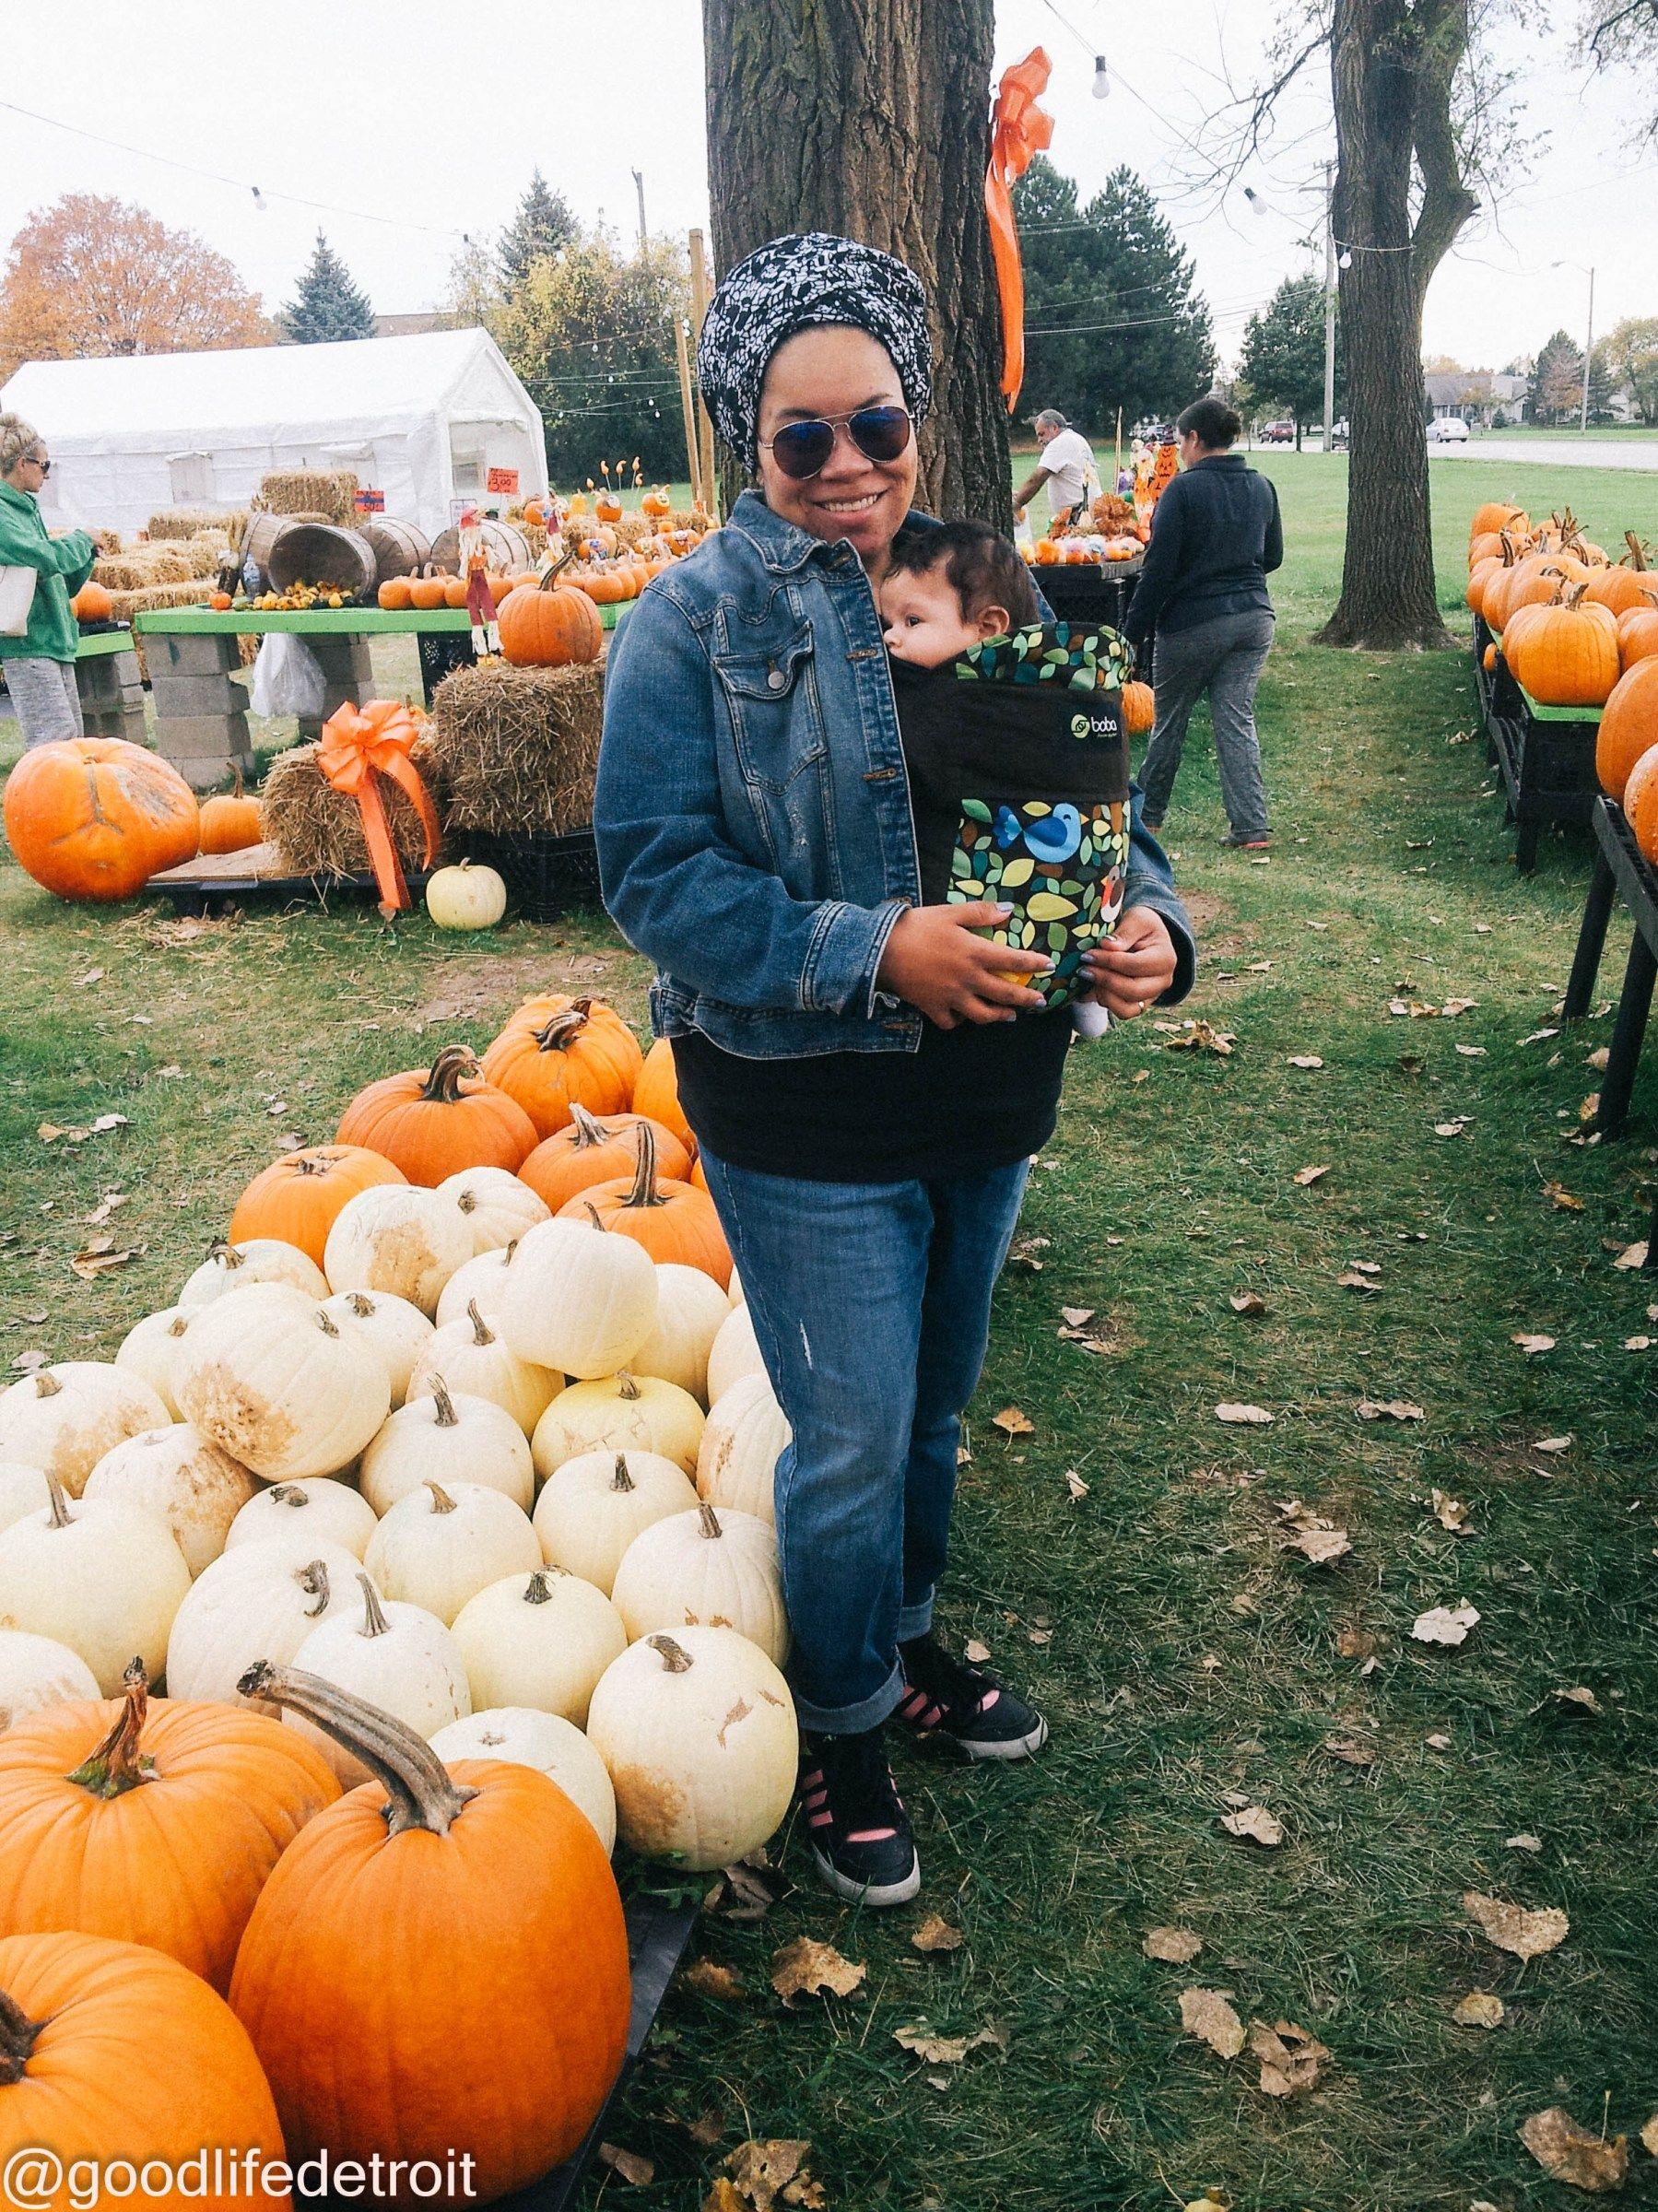 Fun family visit to a metrot detroit pumpkin patch best